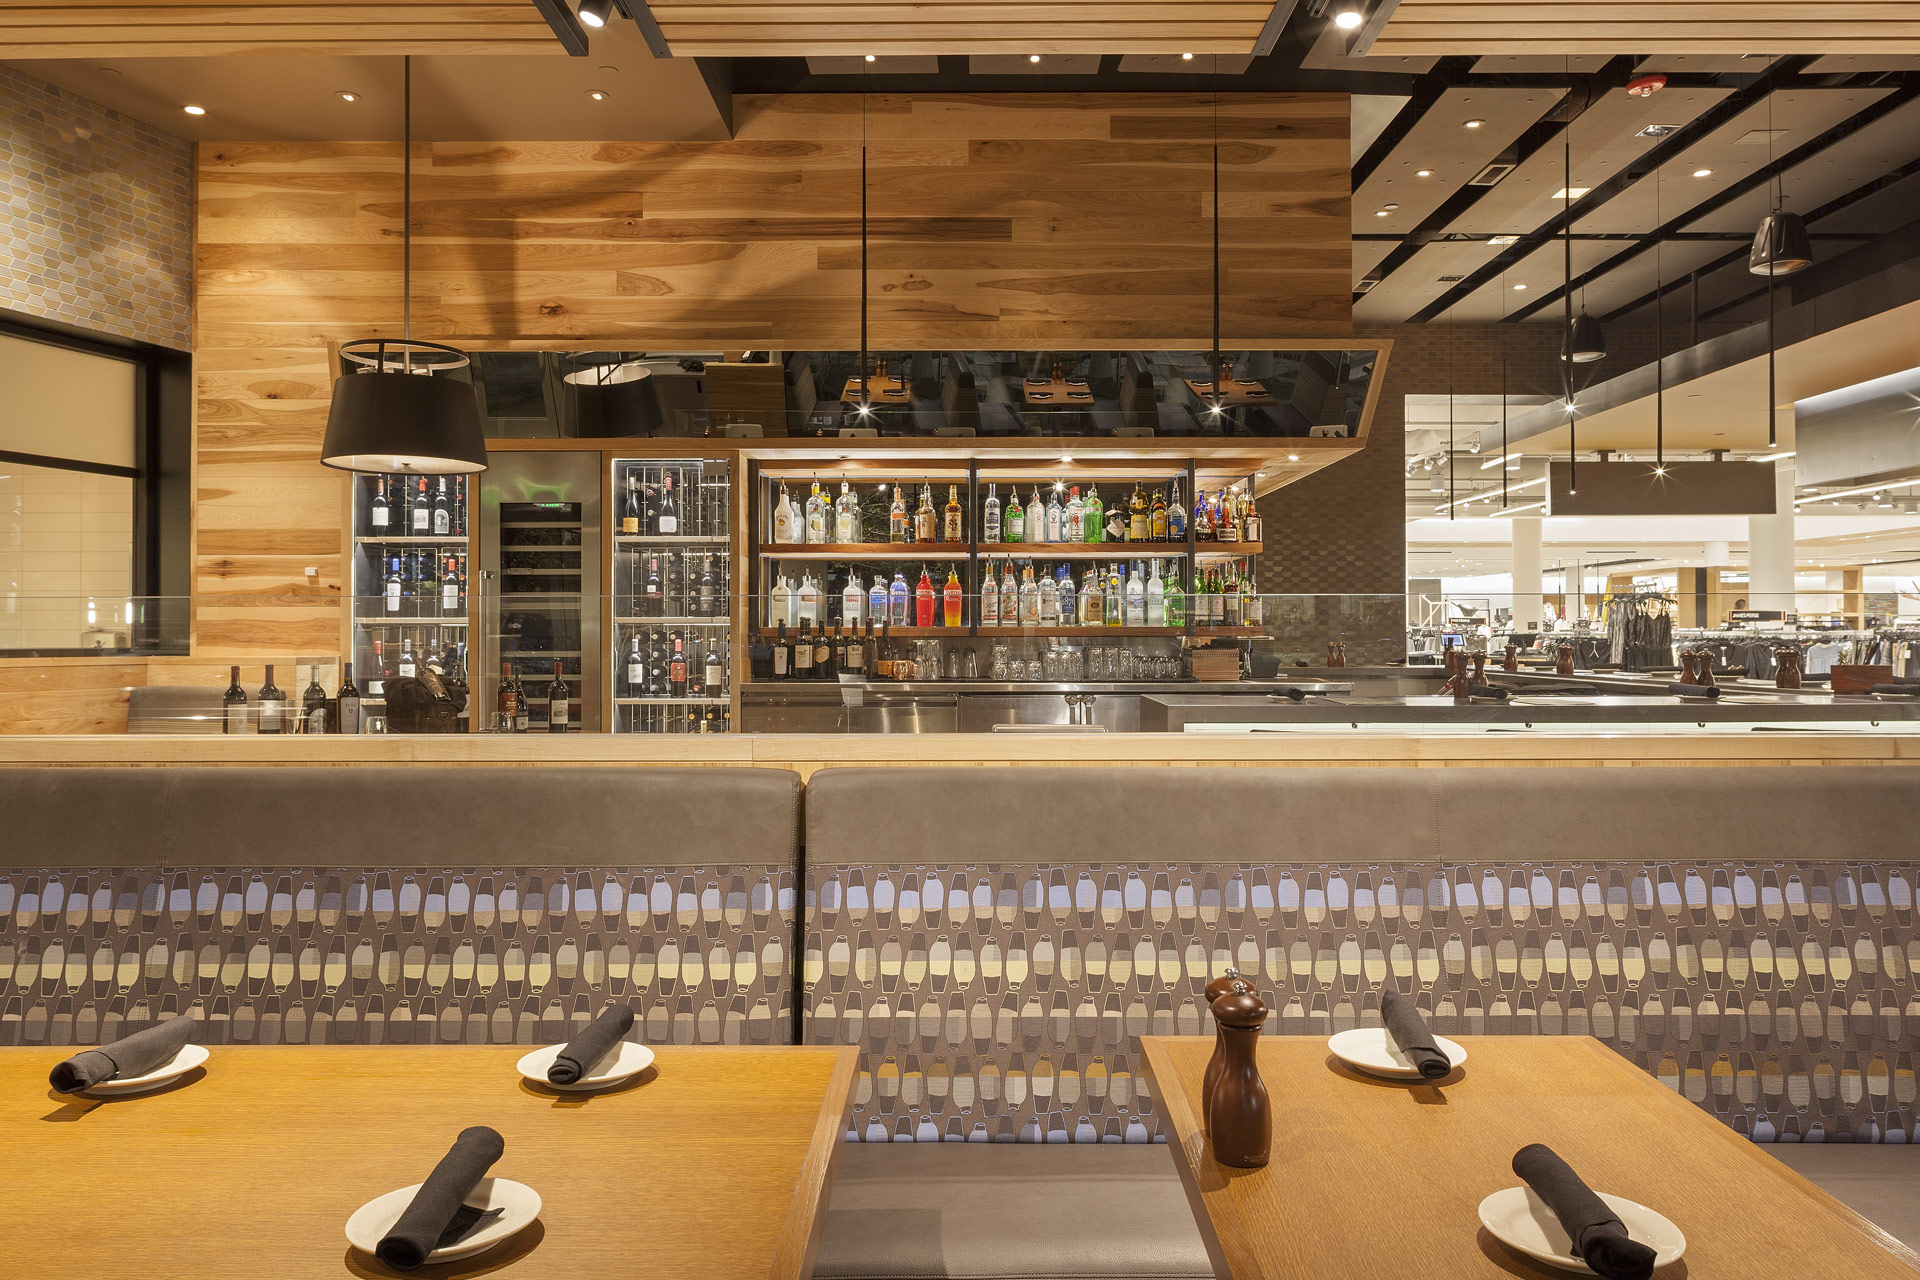 Bazille at Nordstrom Restaurant interiors designs